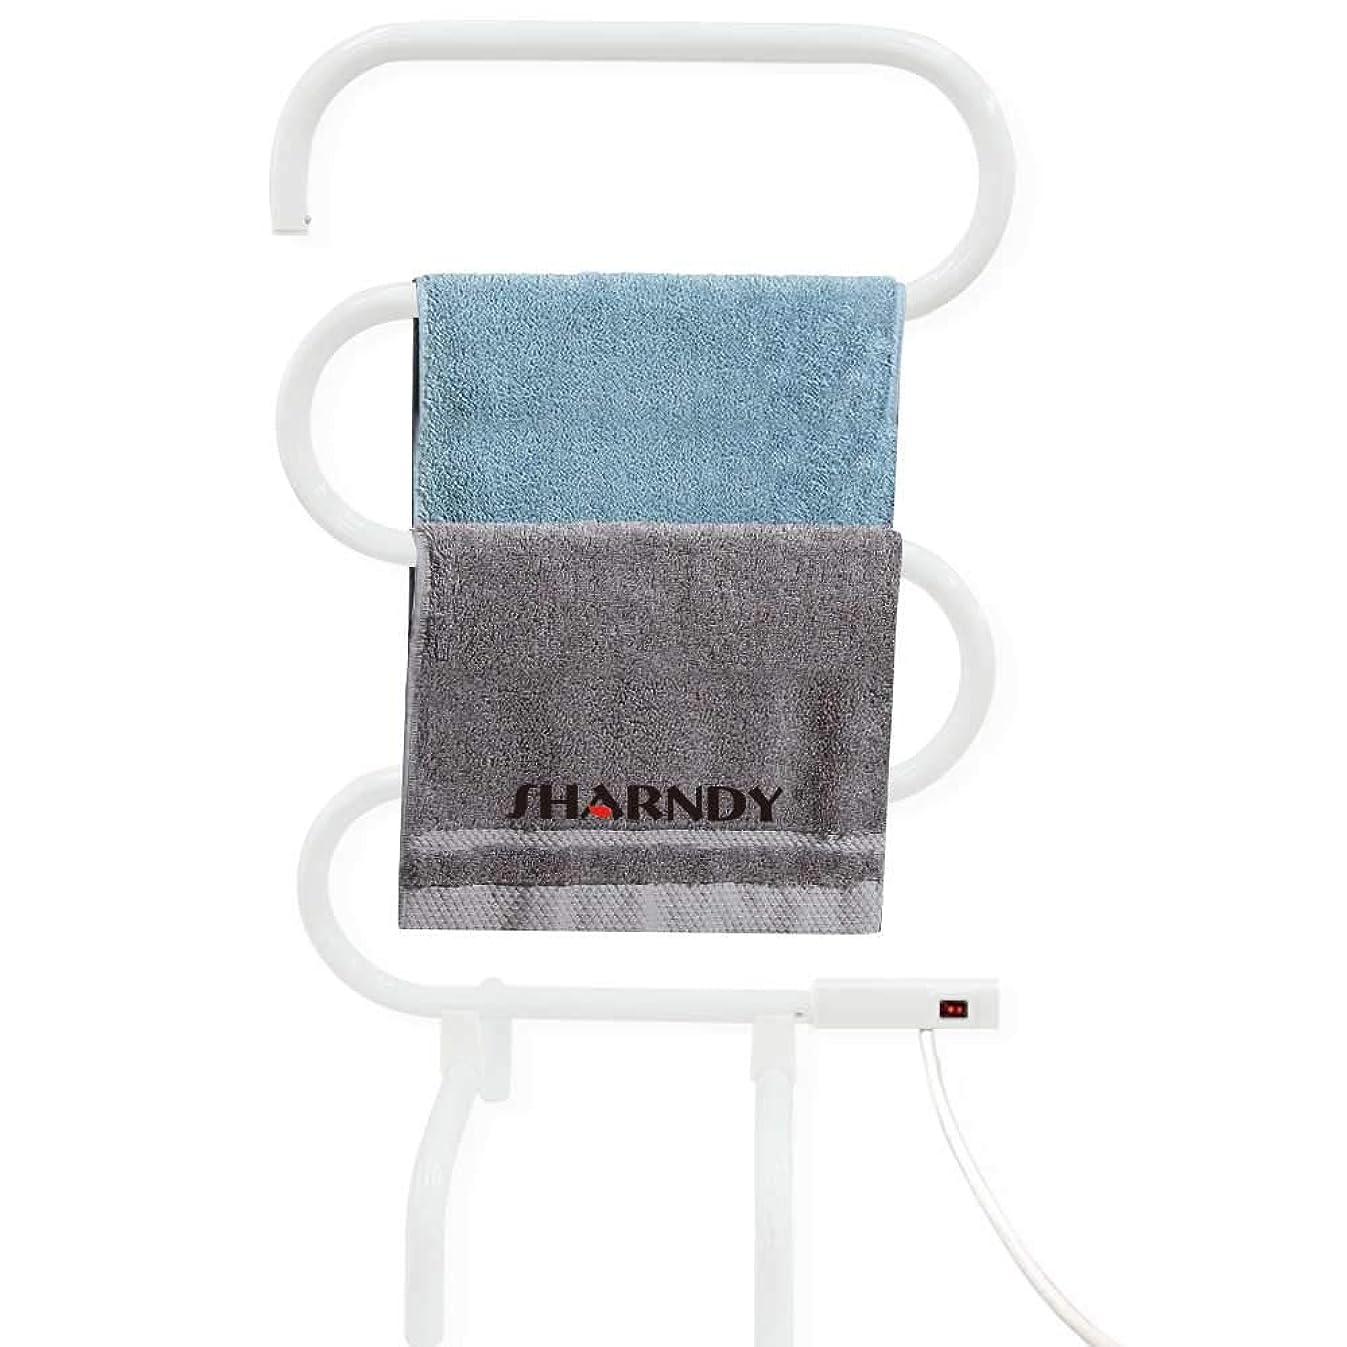 SHARNDY Electric Towel Rails 5-Bar Bath Towel Warmer Free Standing Wall Mounted Portable Heated Towel Rack for Bathroom Plug-in 90W White